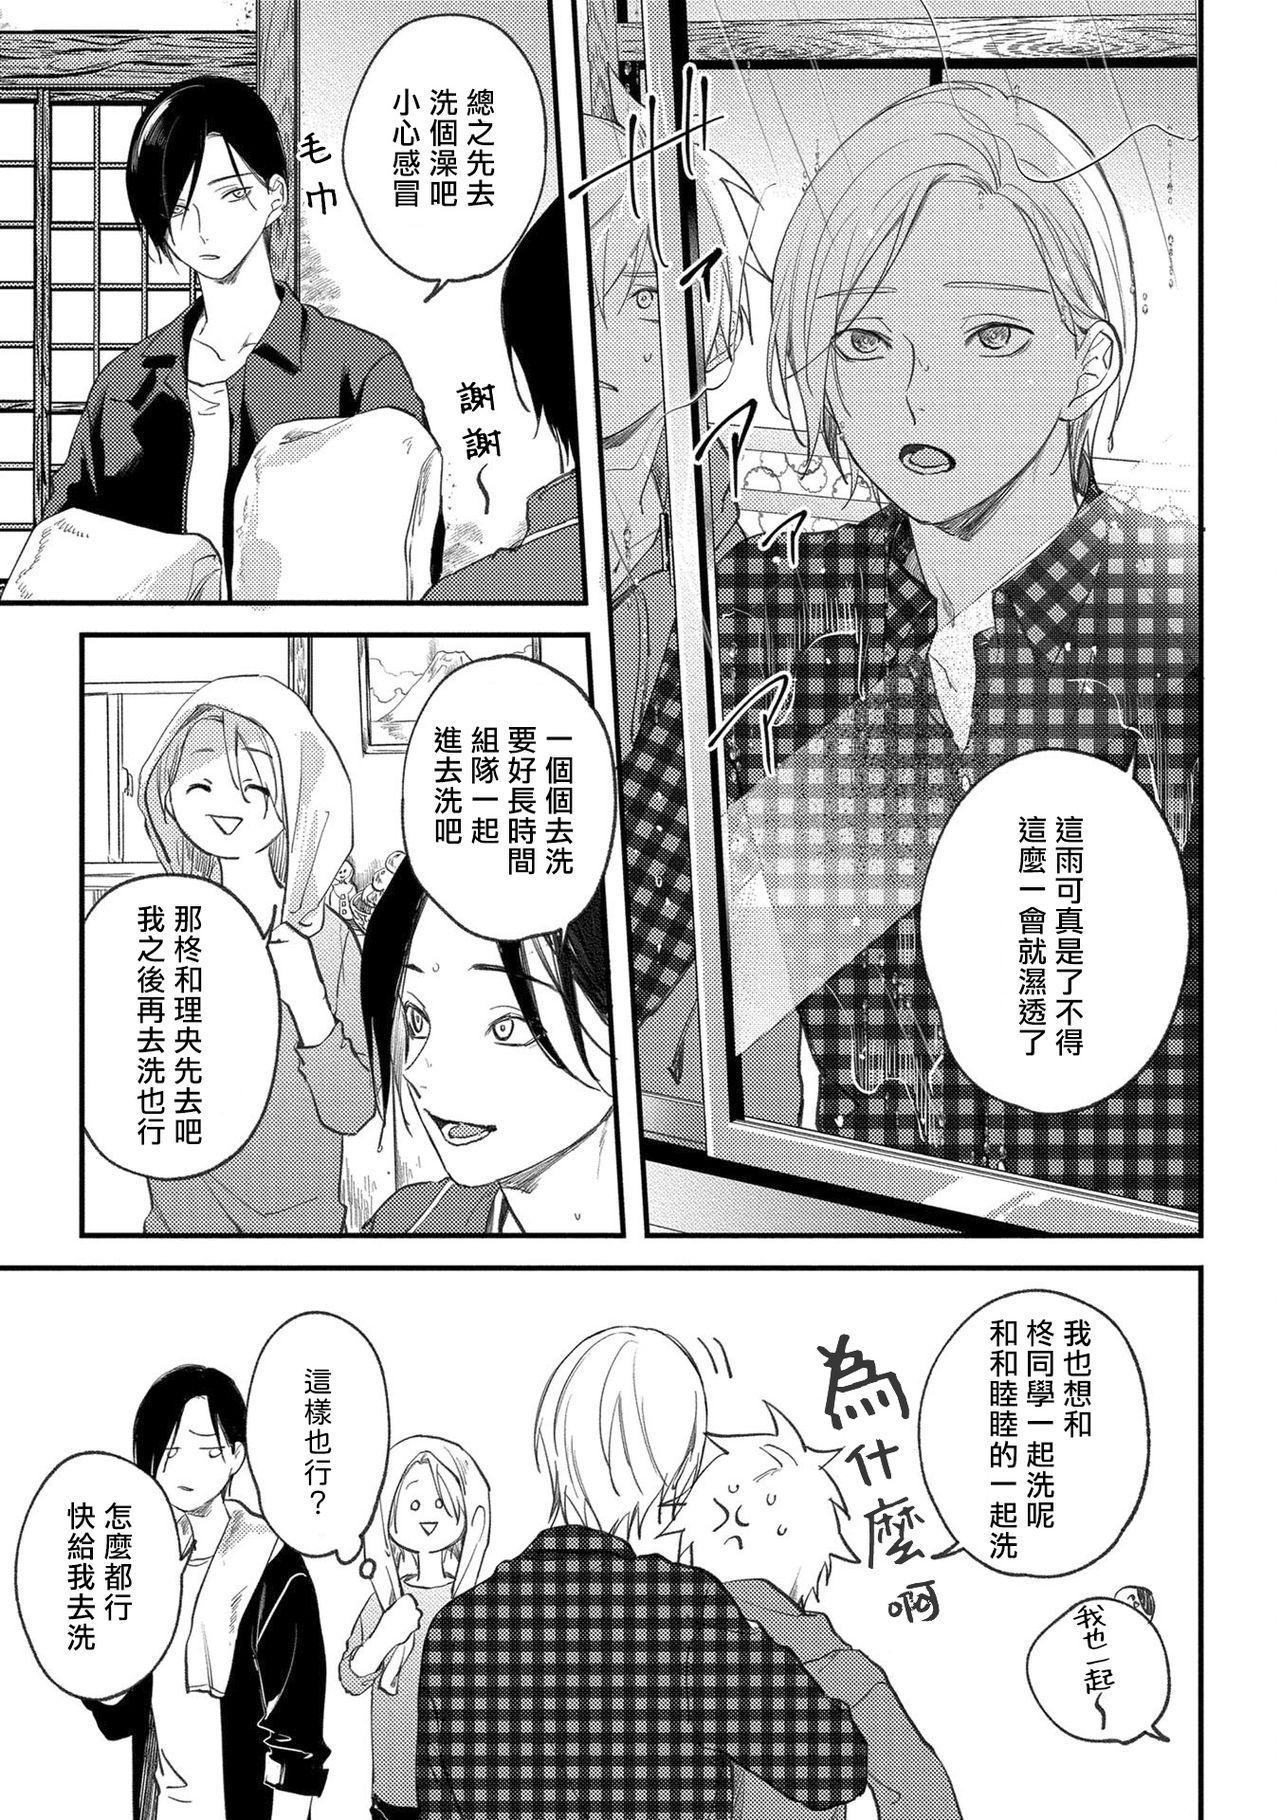 [Utata Hakuto] Houkago Virginity - Virginity afterschool 1-5 完结 [Chinese] [拾荒者汉化组] [Digital] 144